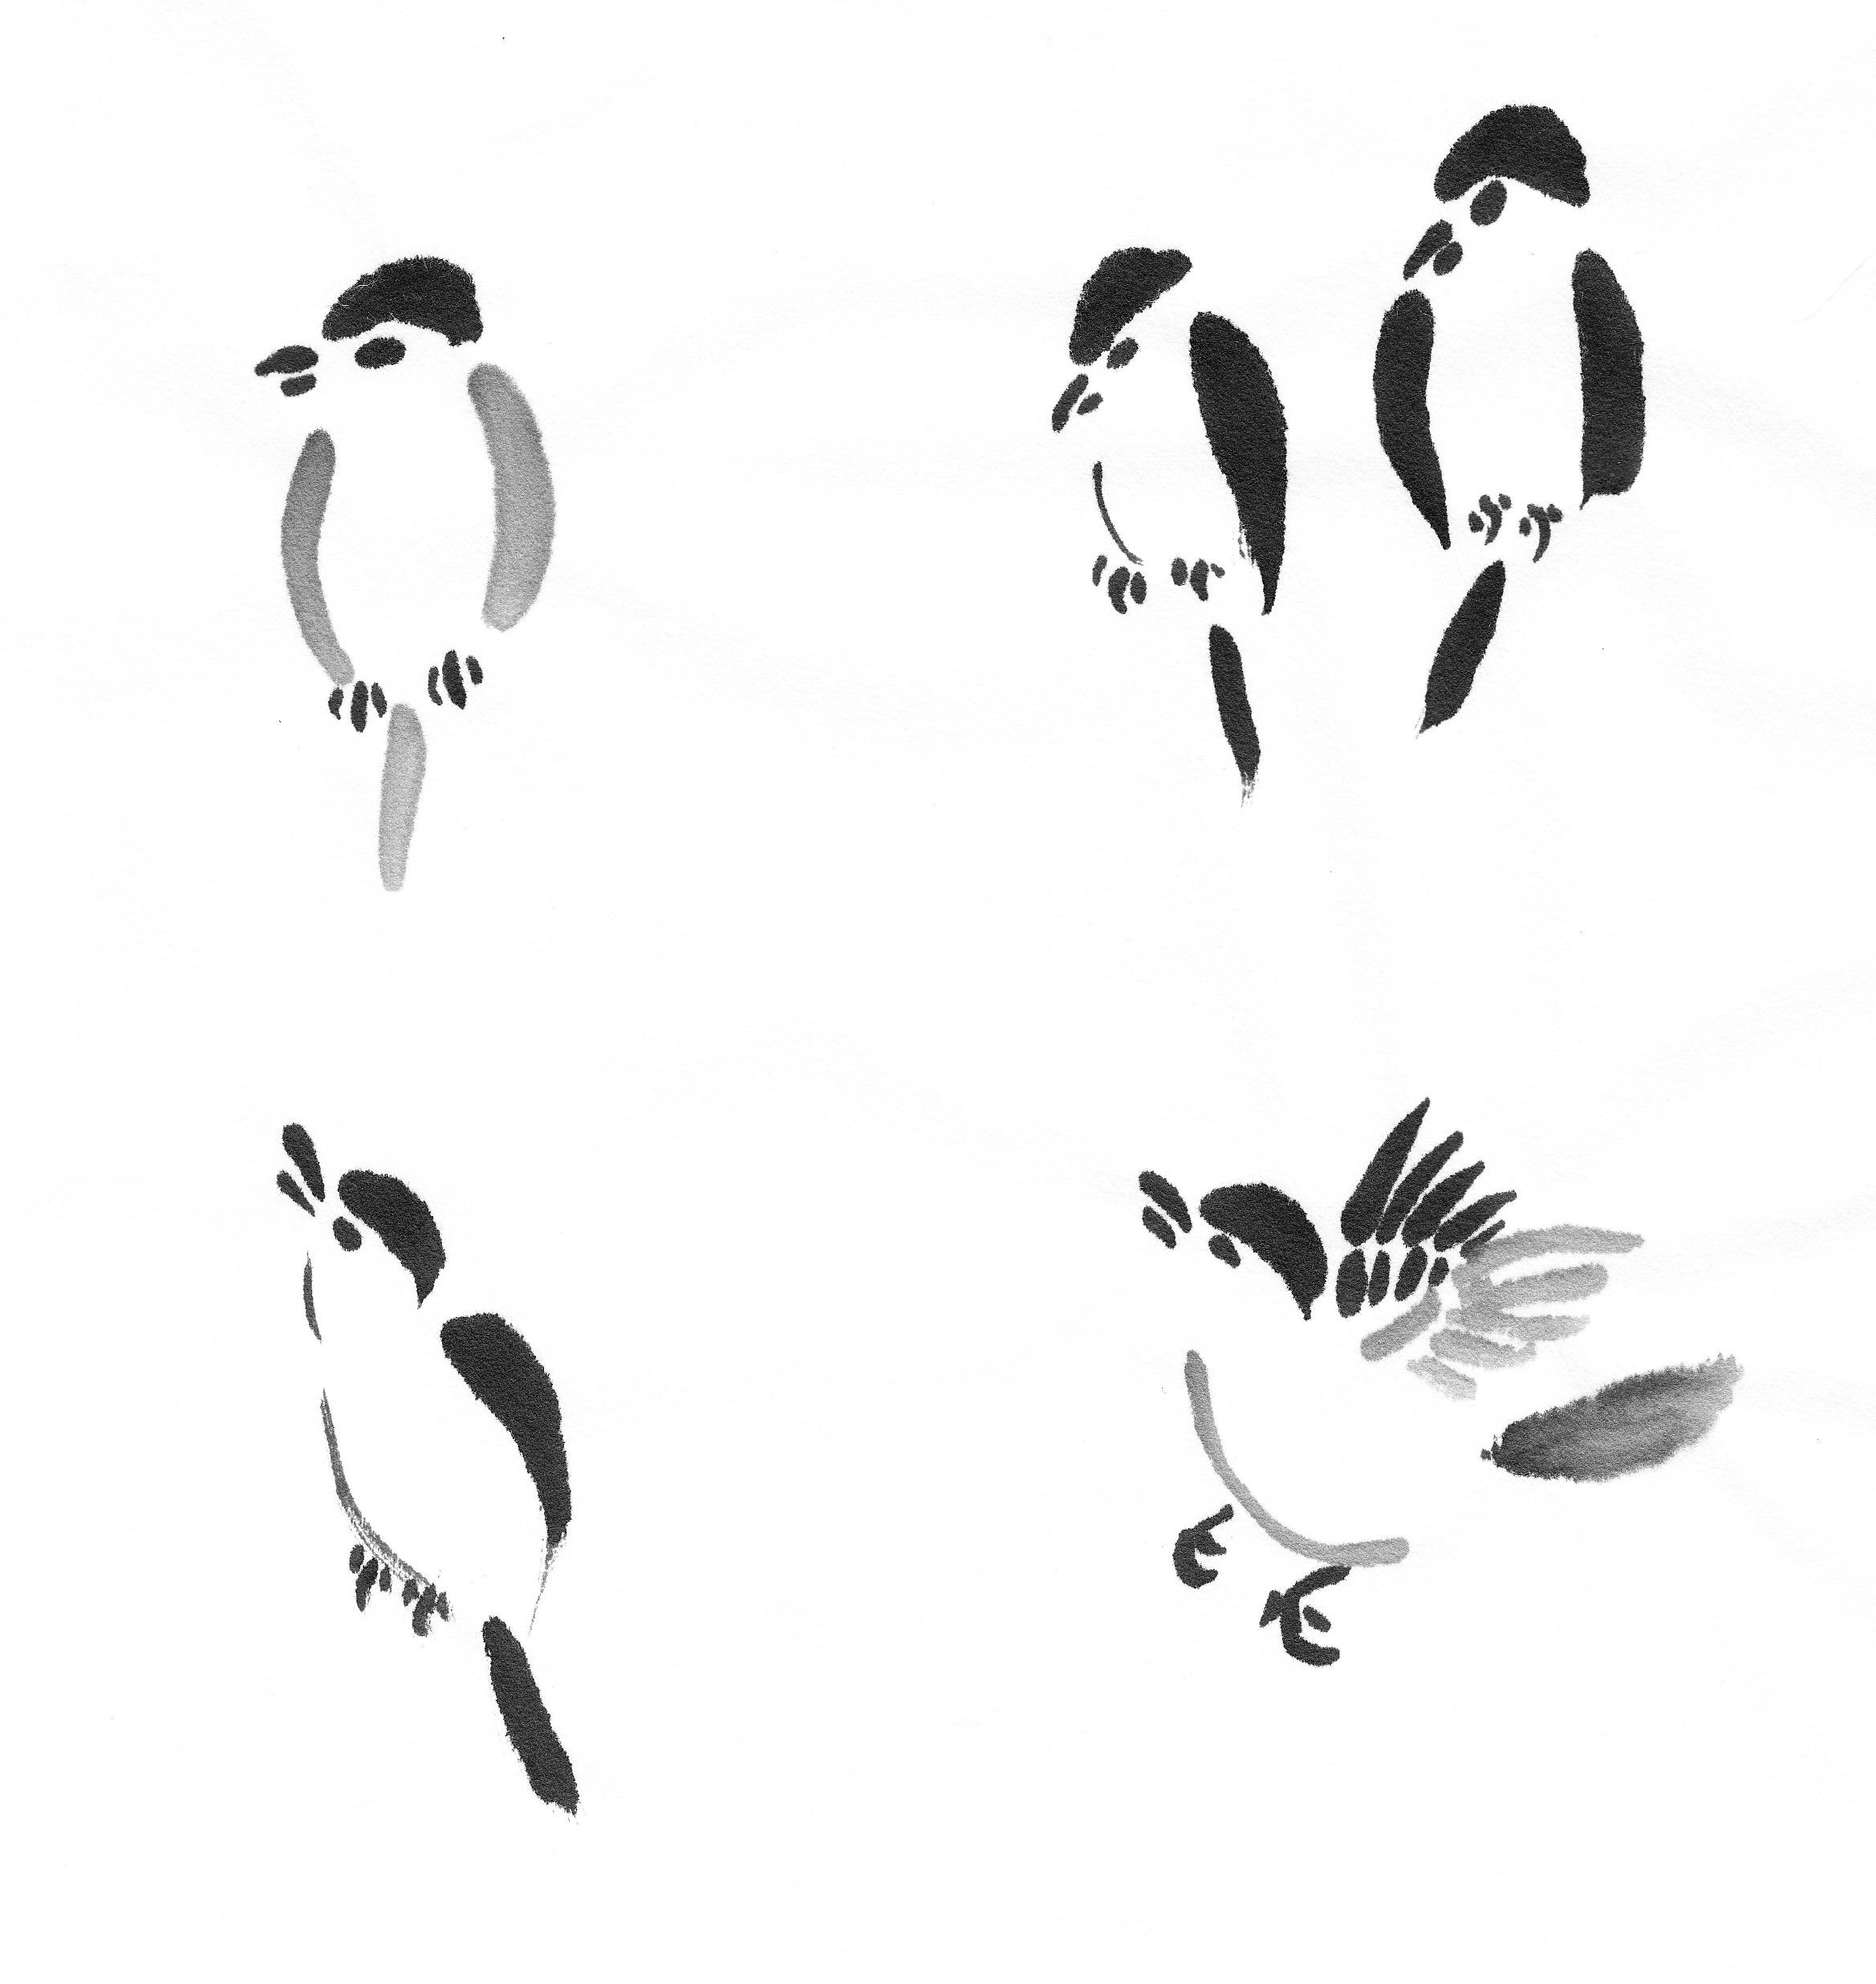 Little Brown Birds Followmybrushmarks